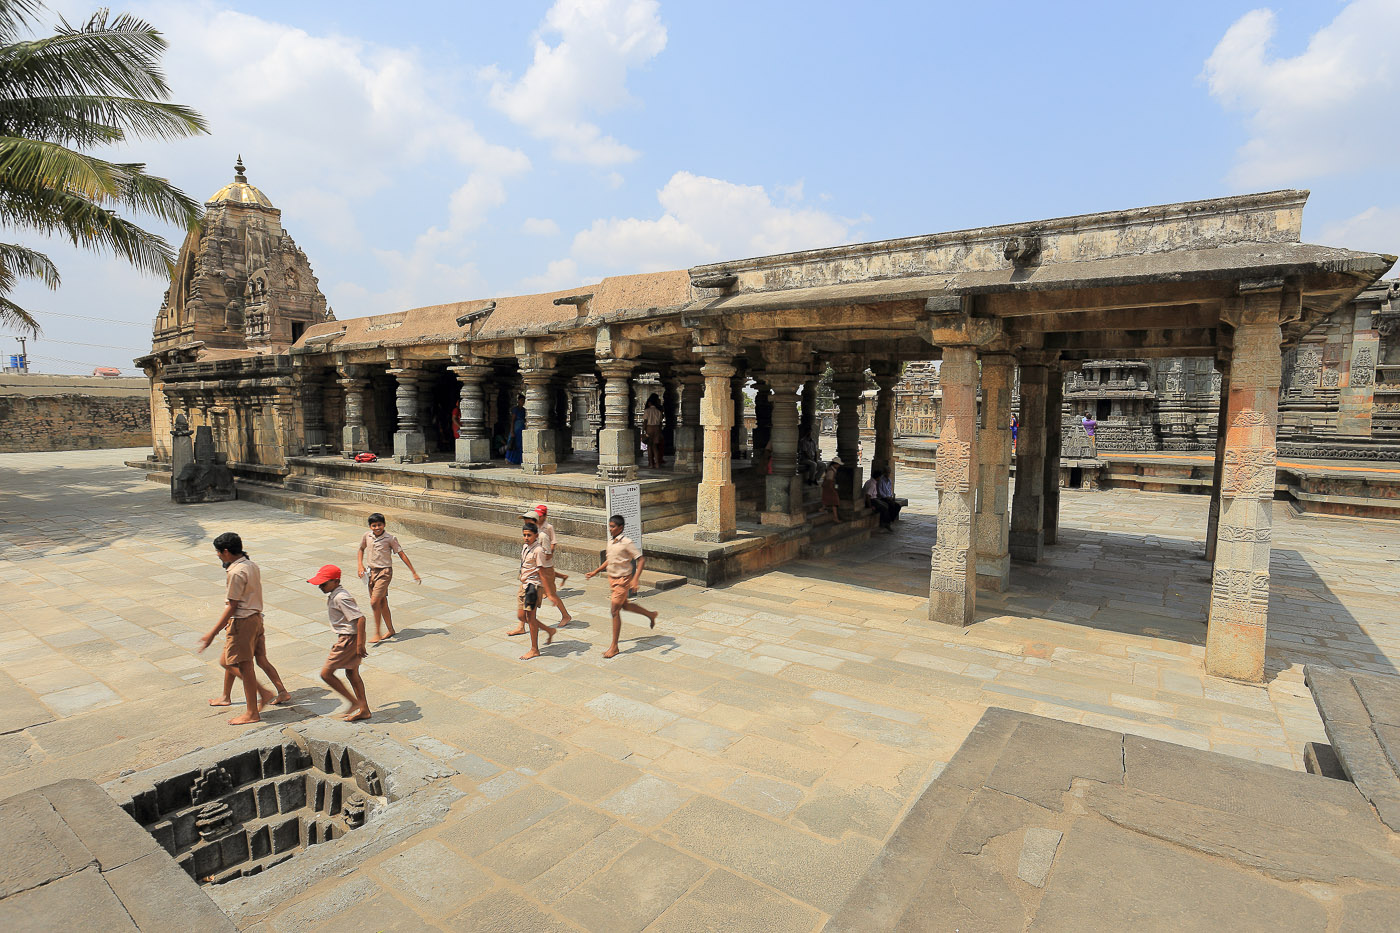 Фото № 20. Sowmyanayaki Temple – храм Лакшми. Один из малых храмов. (1/60, 0 eV, f 10, 17mm, ISO 100.